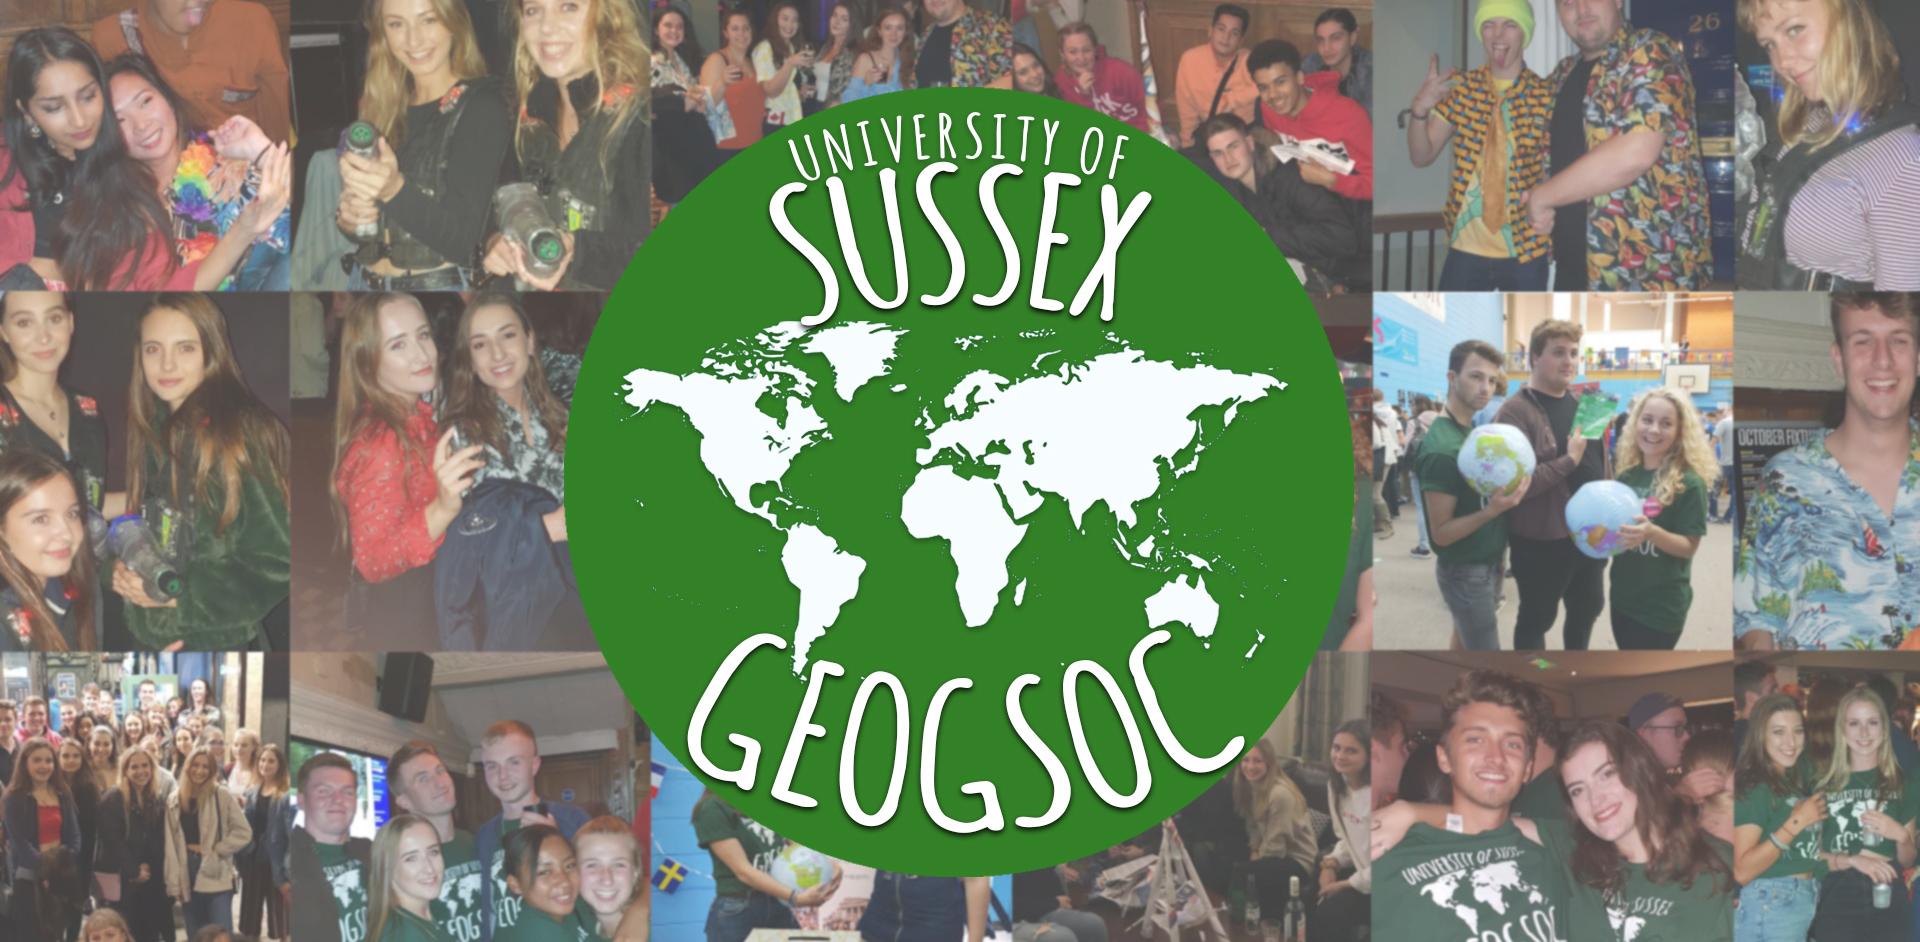 Geogsoc (Geography Society) image